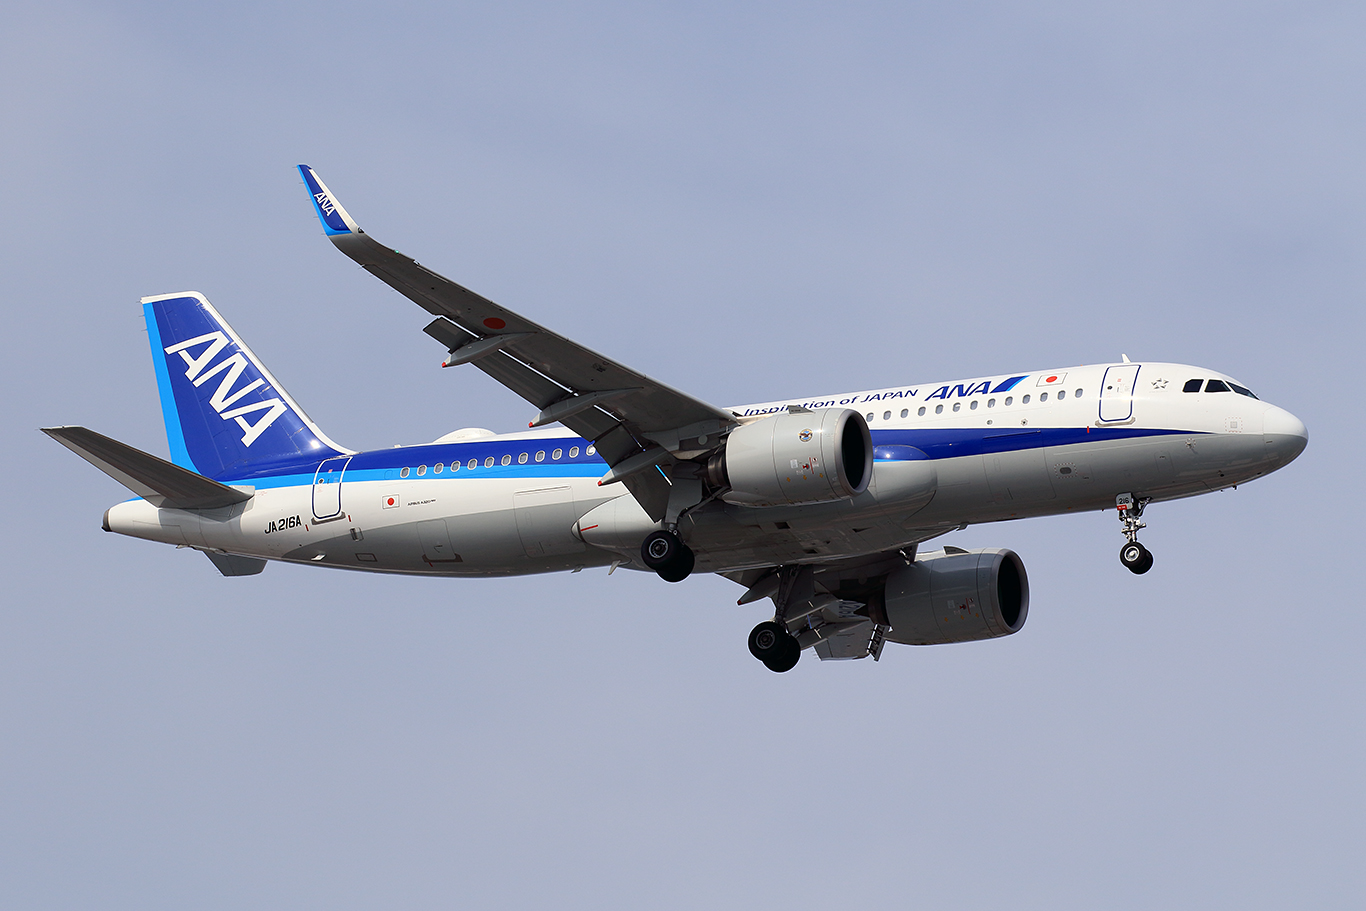 NH/ANA/全日空 NH656 A320Neo JA216A